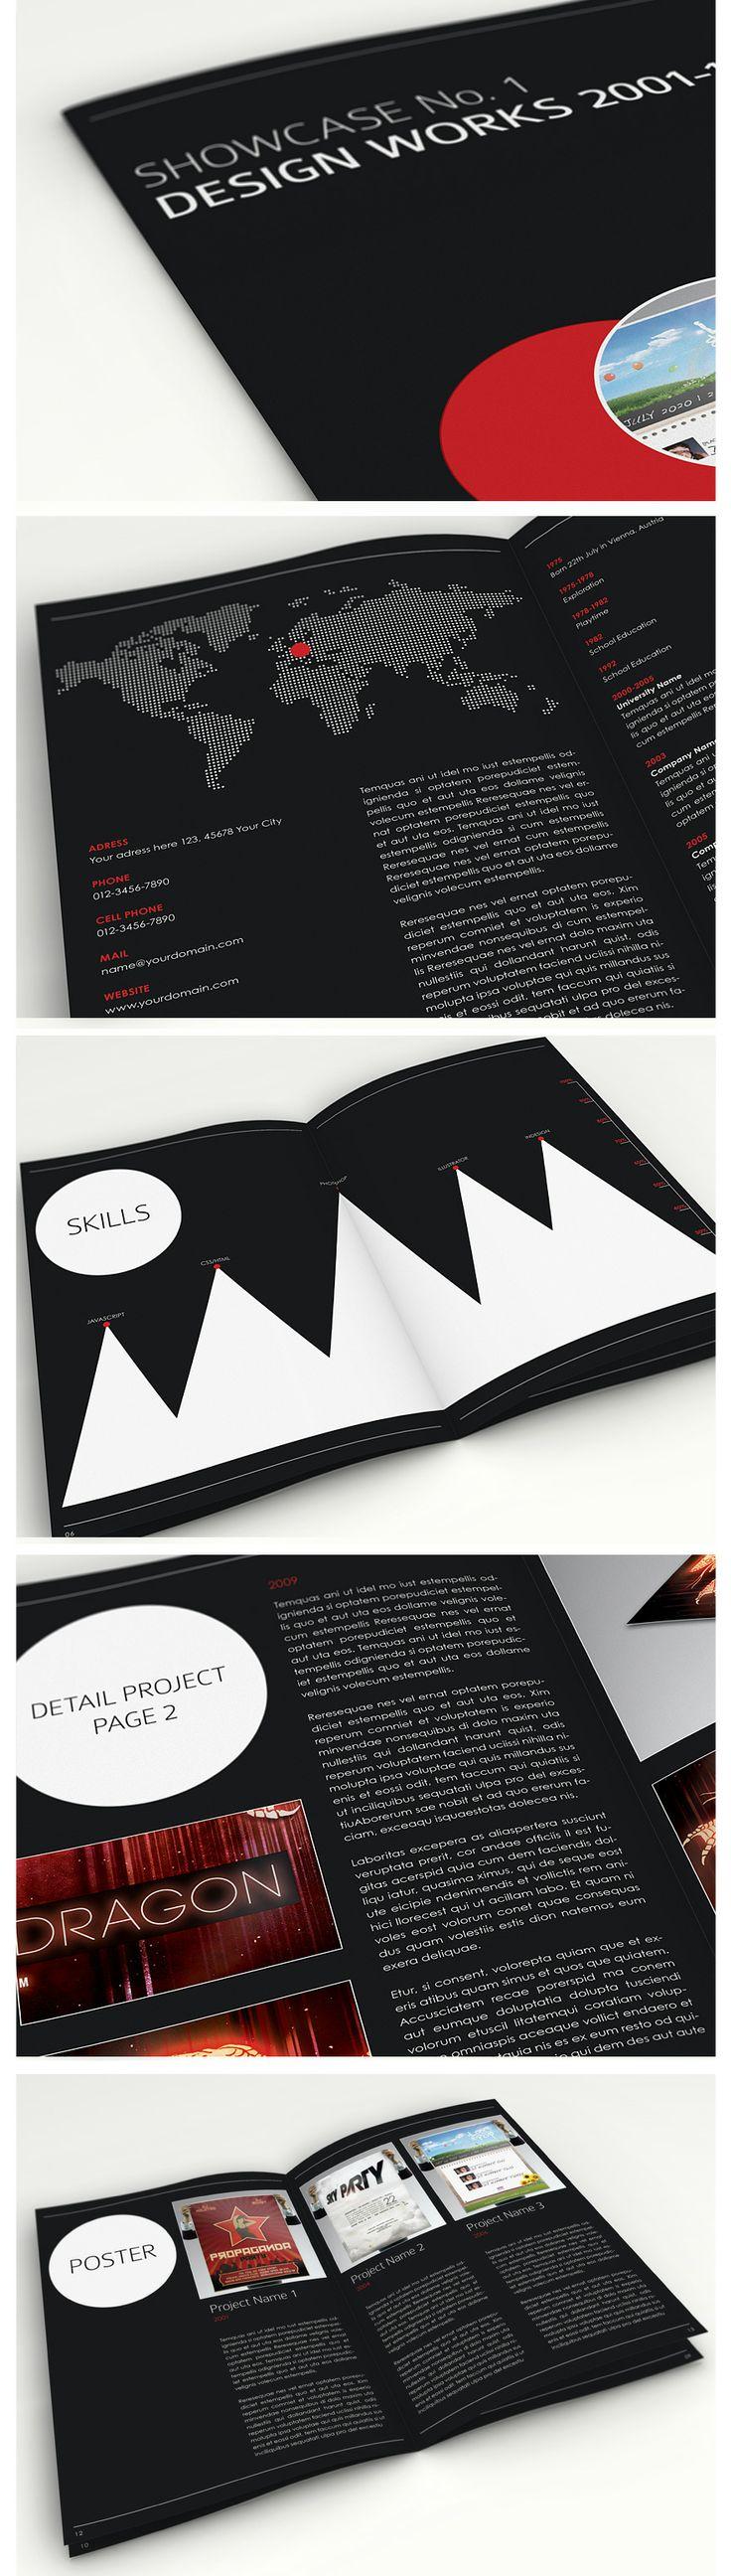 Showcase No. 1 - Brochure & Book Template #brochure #editorial